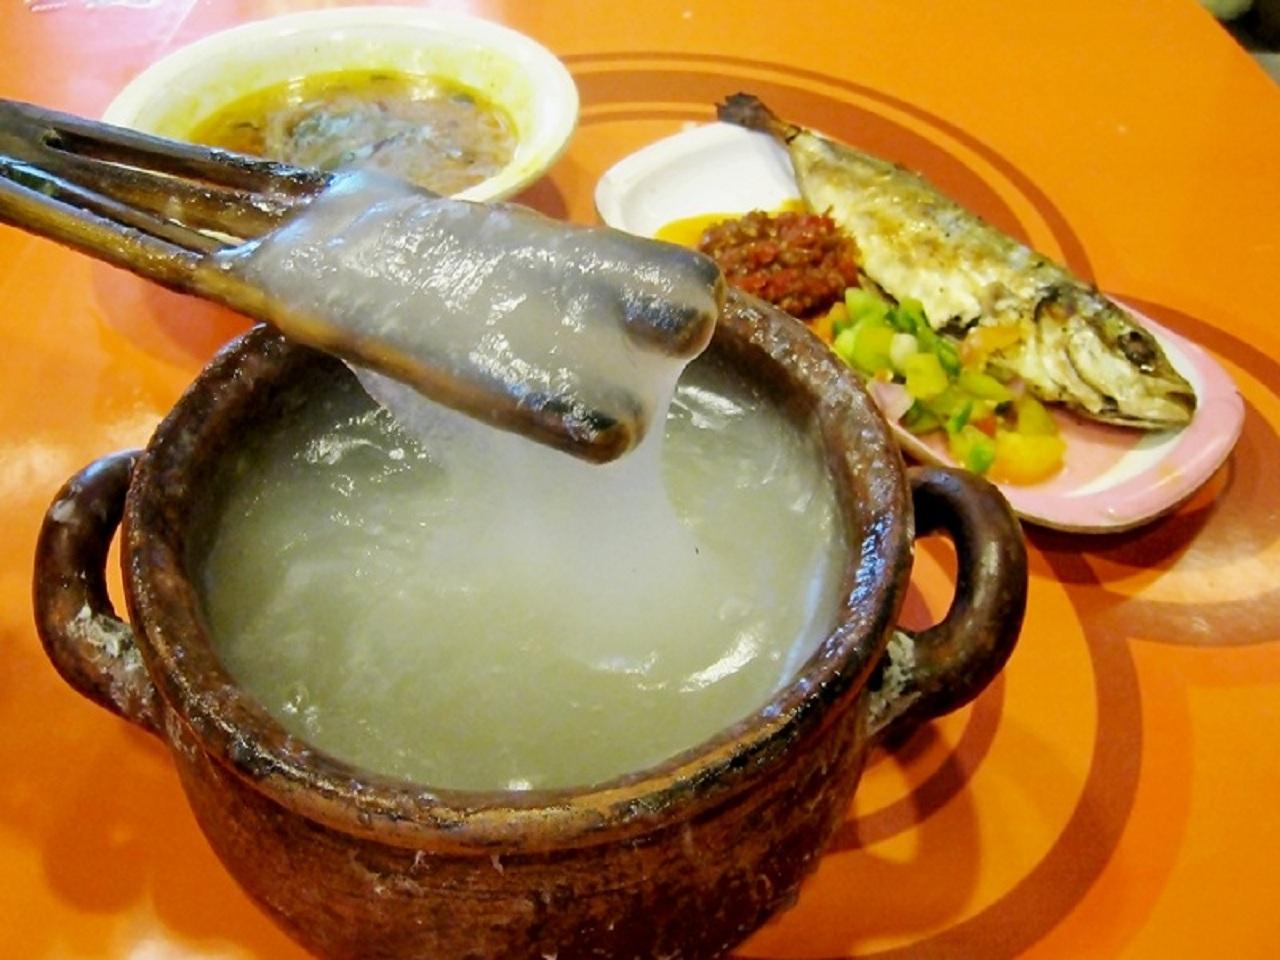 Makanan Khas Daerah Ujung Timur Indonesia yang Sangat Unik